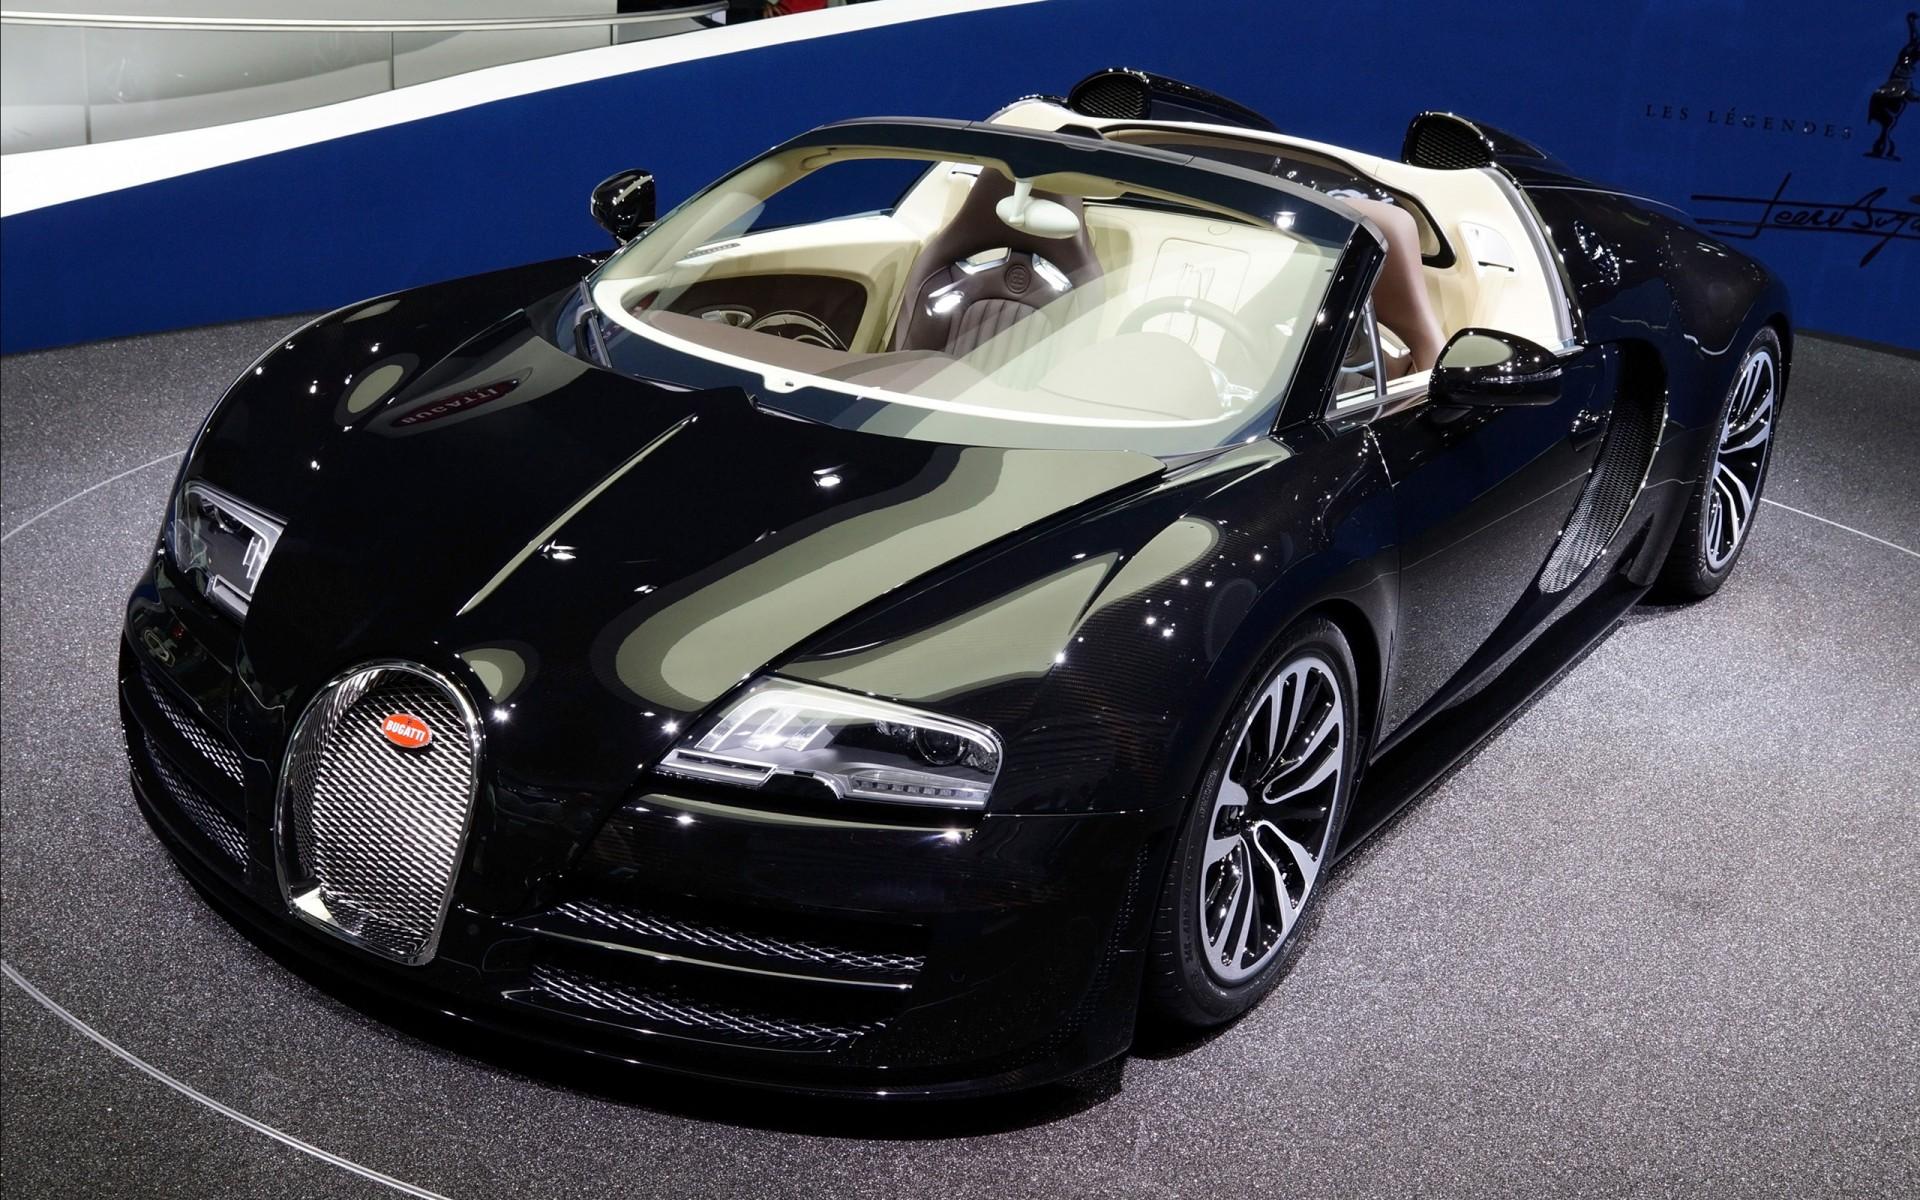 Cars Wallpapers: 2013 Bugatti Veyron IAA Frankfurt Motor Show Wallpaper